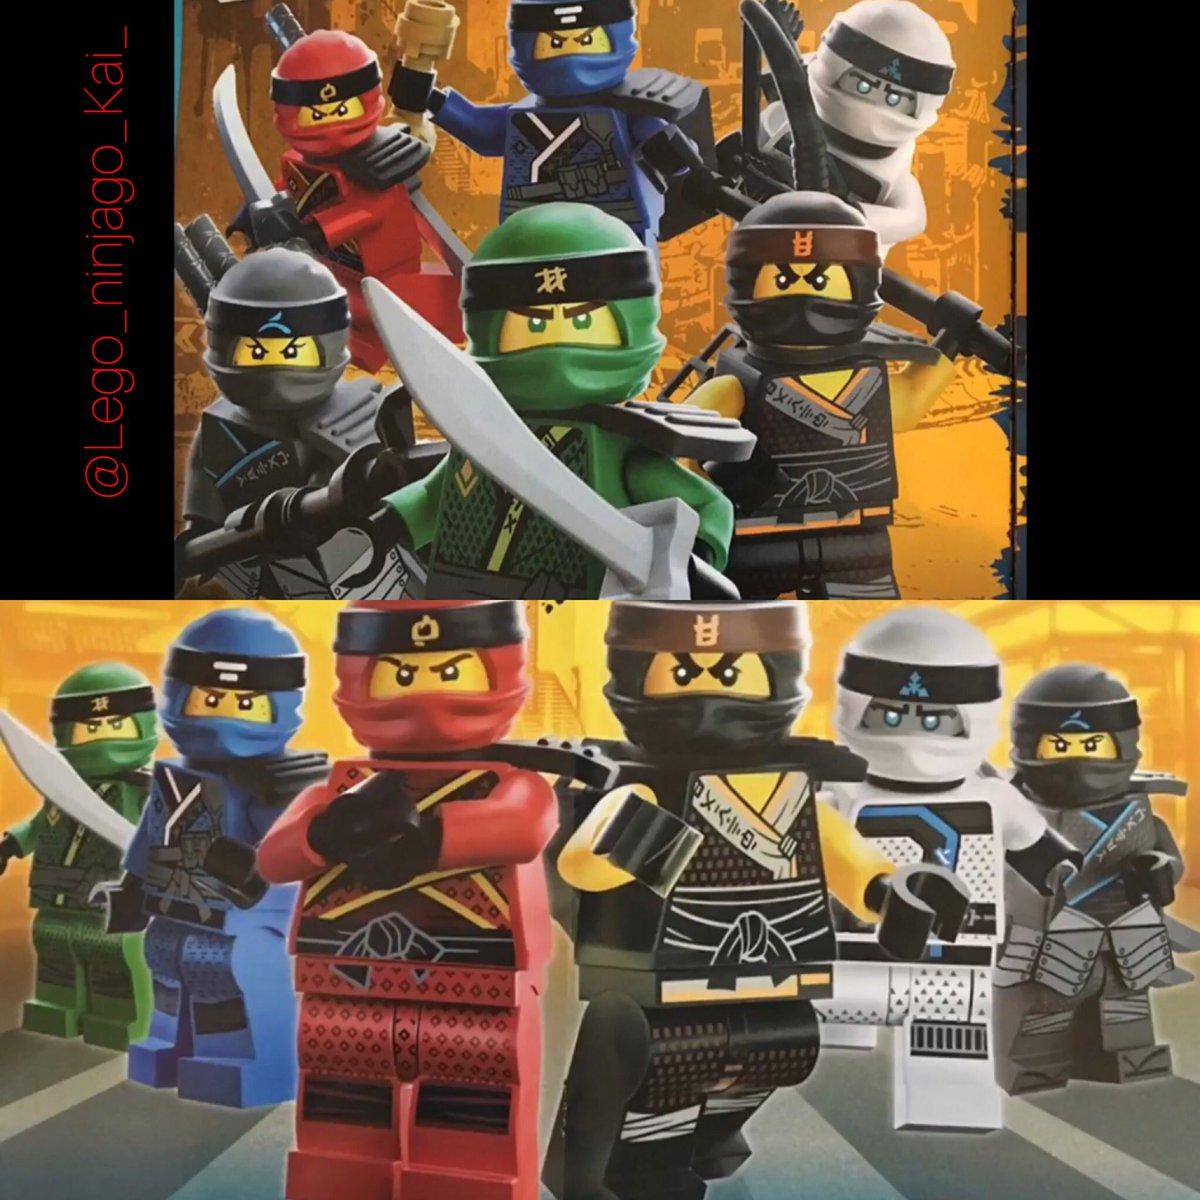 Lego ninjago kai on twitter hd sog posters lego legoninjago kai jay zane cole nya - Ninjago lloyd and kai ...